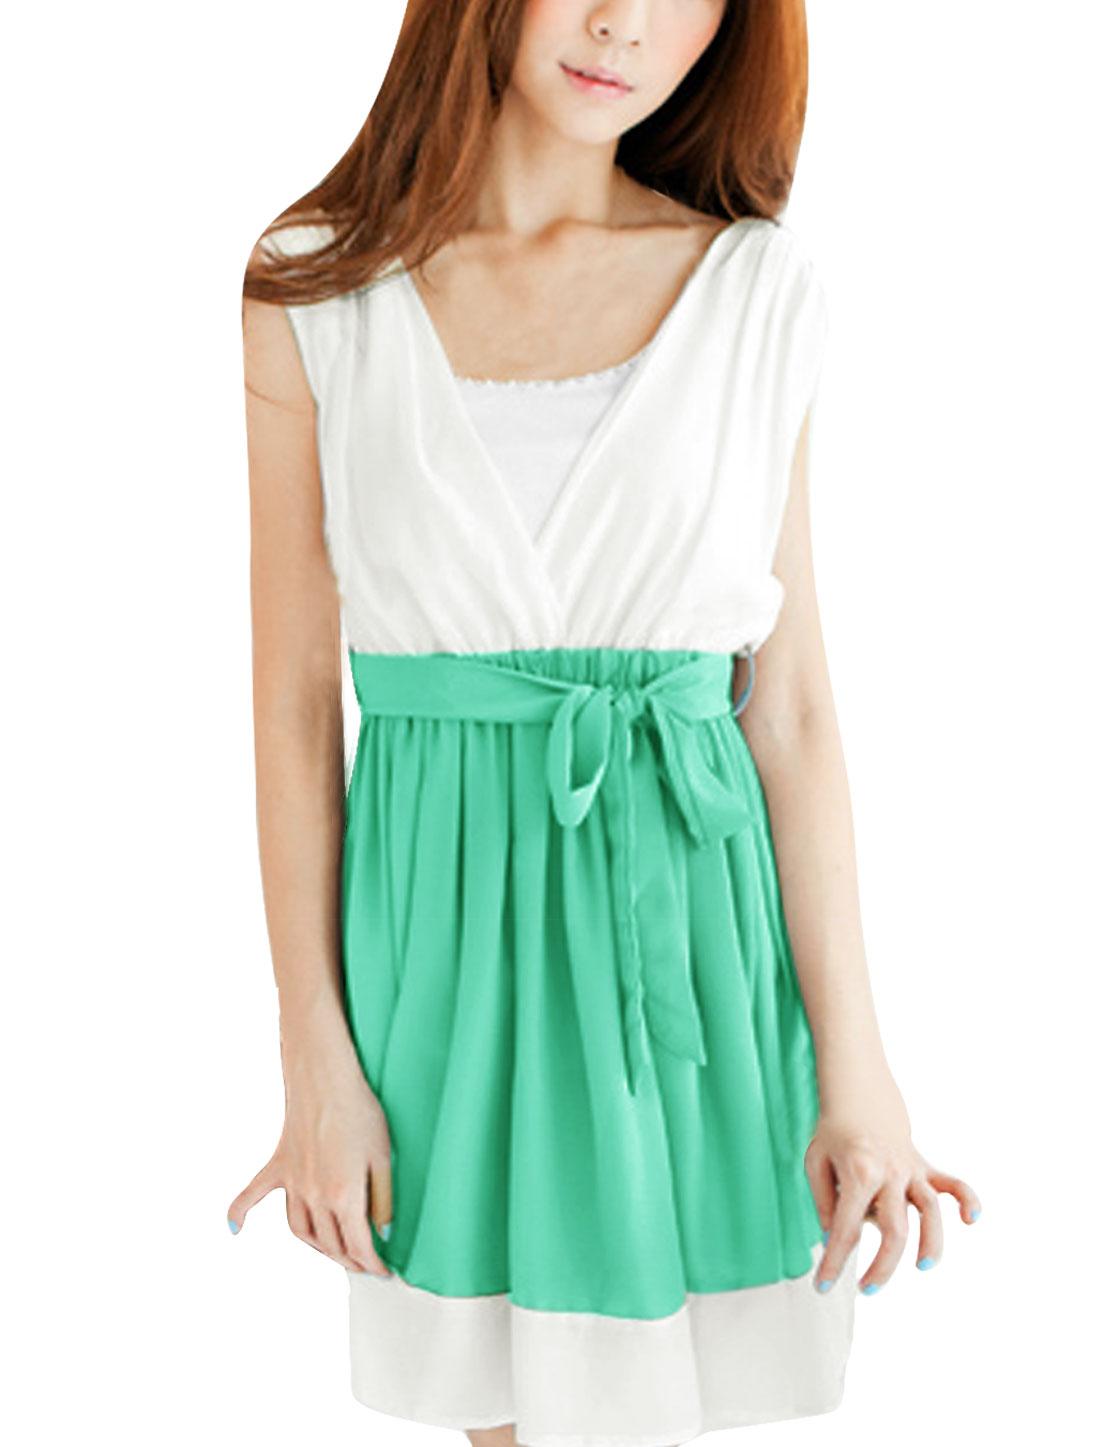 Women Deep V Neck Elastic Waist Green White Belted Summer XL w Tube Top